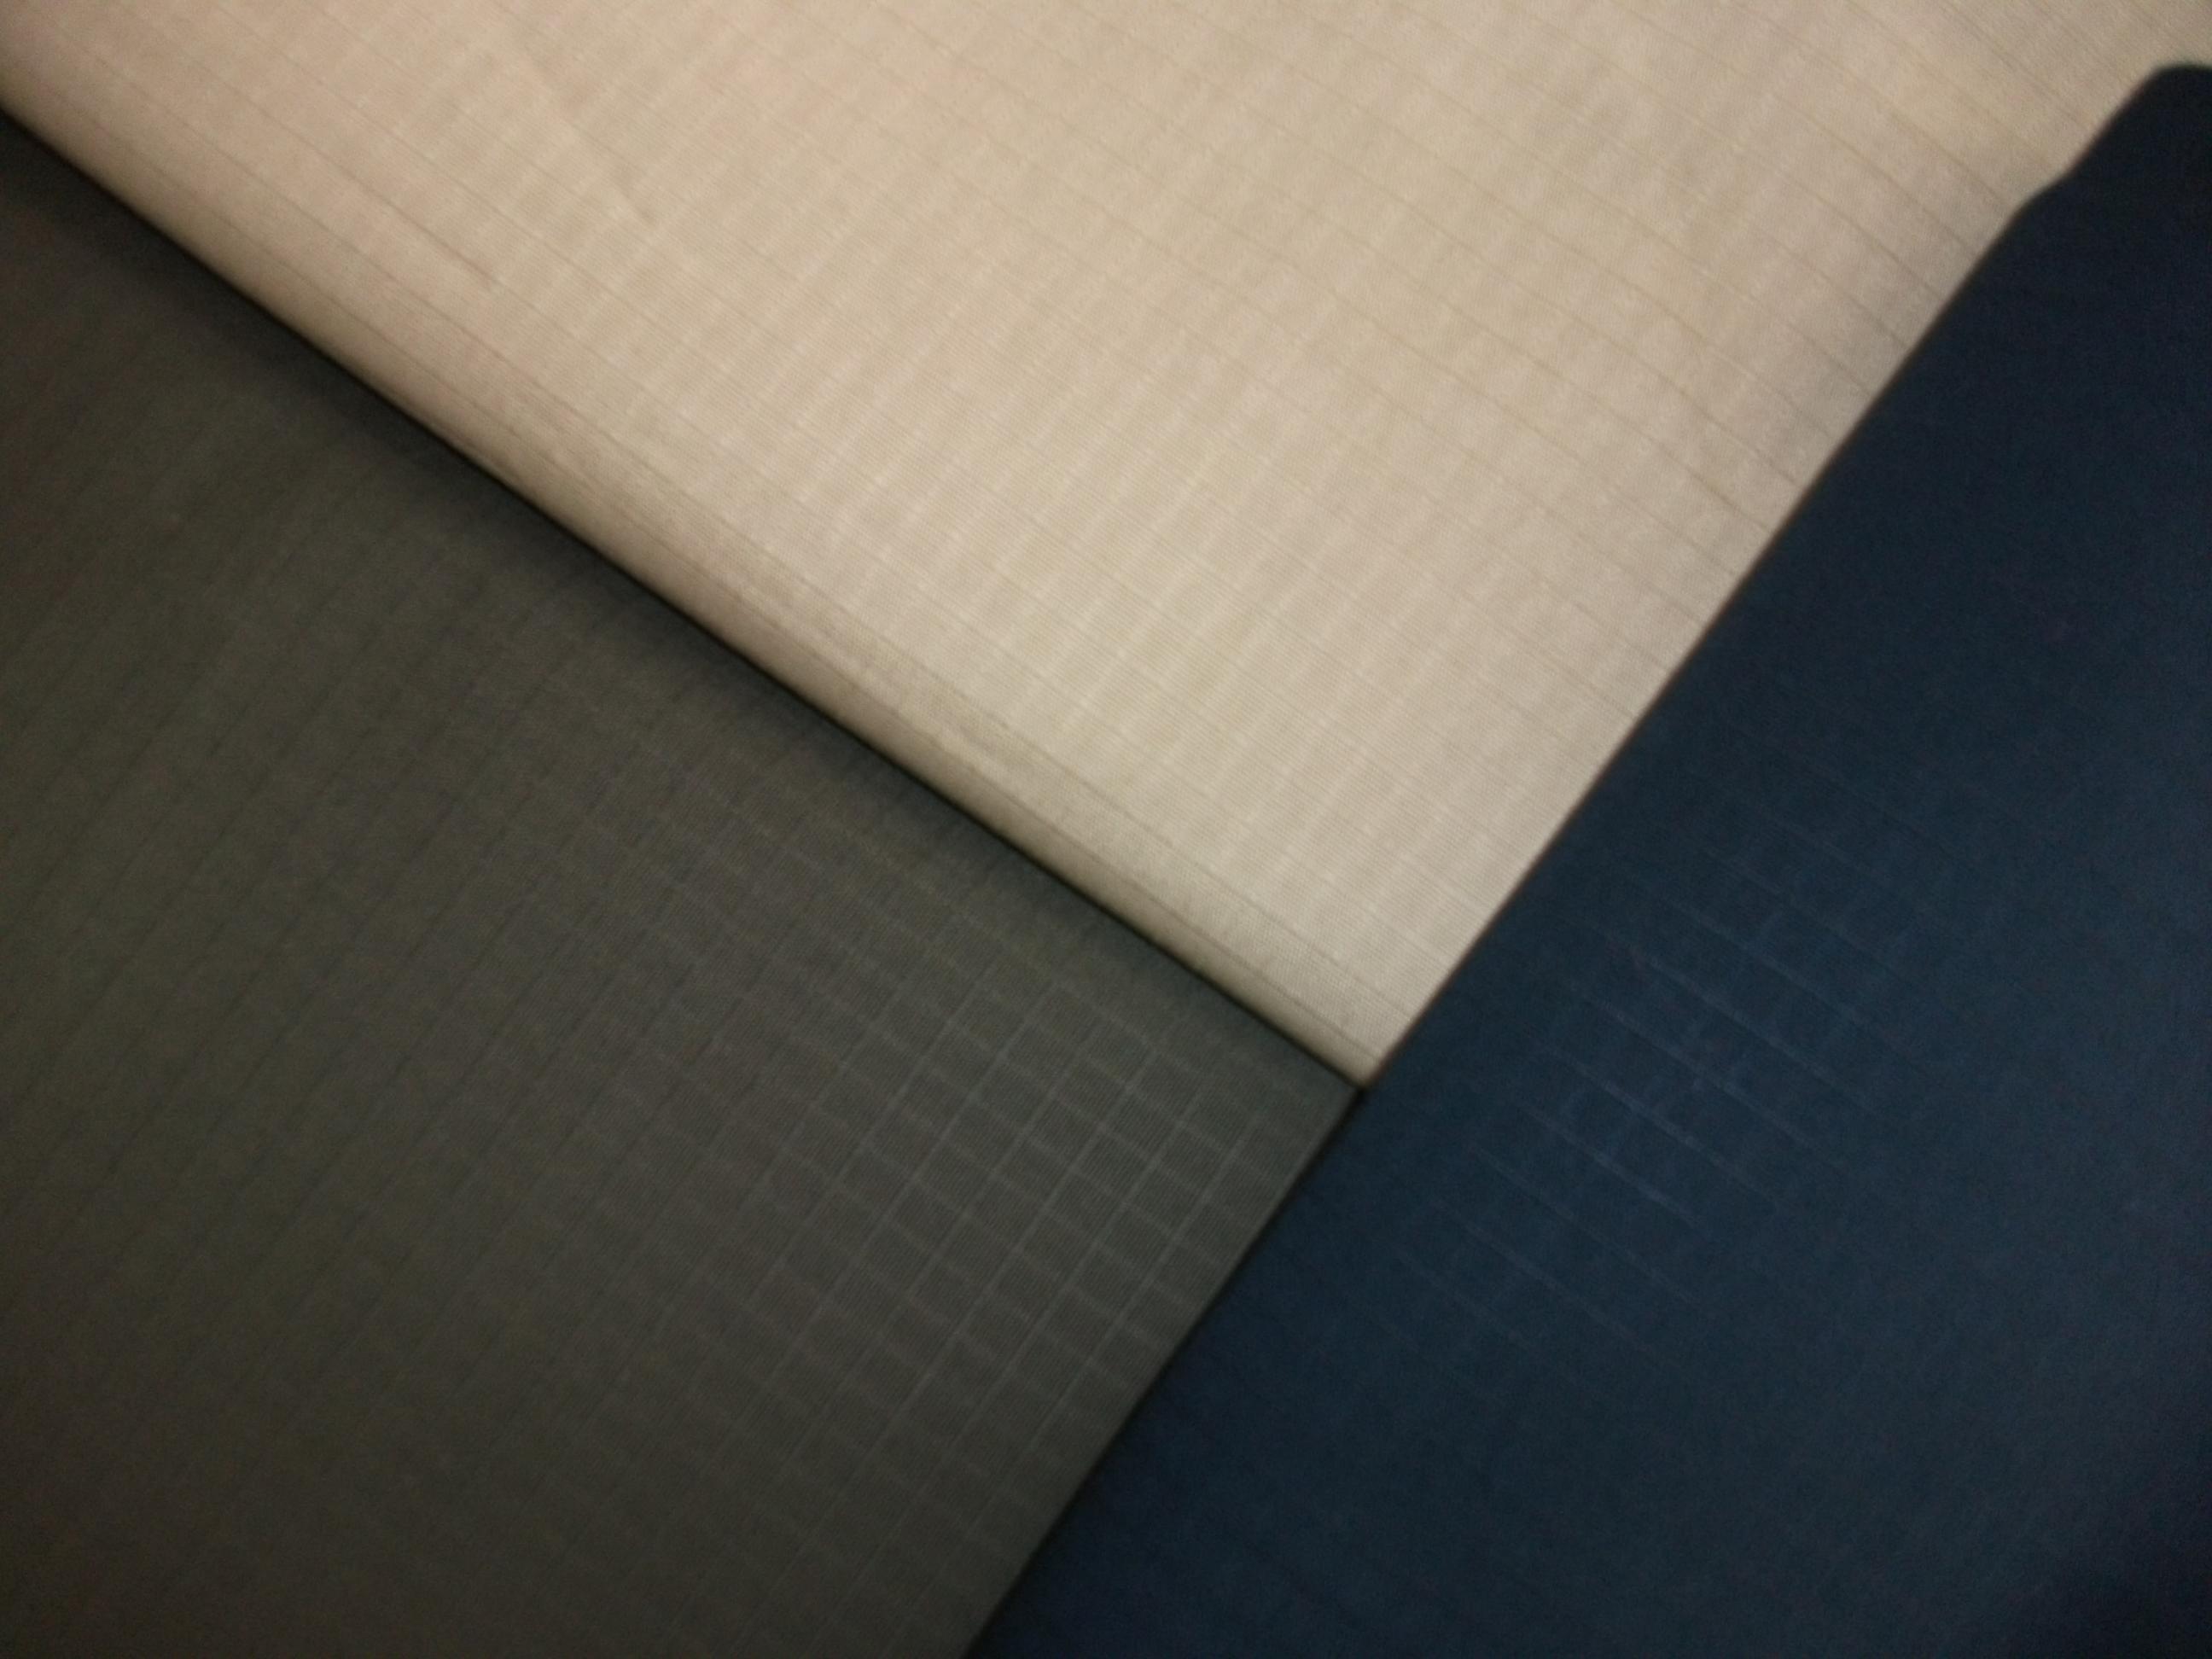 ristop fabric